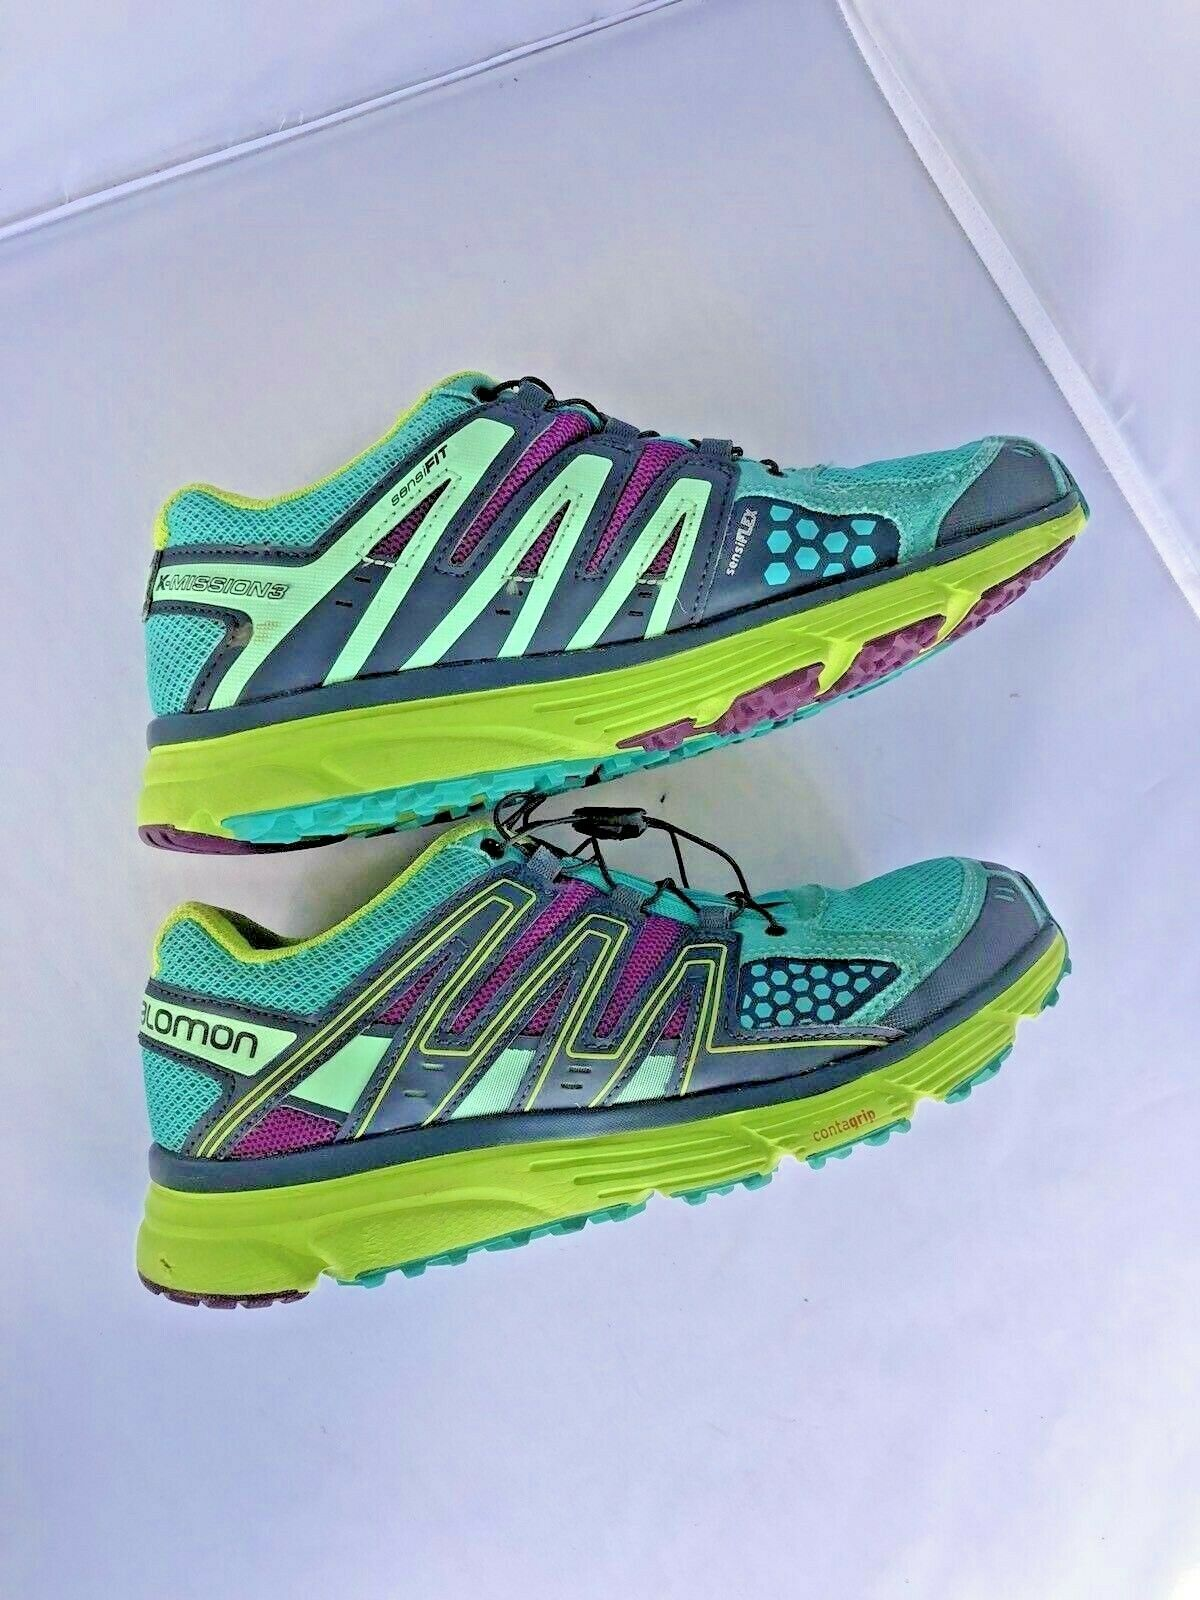 Salomon X Mission 3 Hiking Shoes Size 8 Breathable Running Contagrip Sensifit image 4